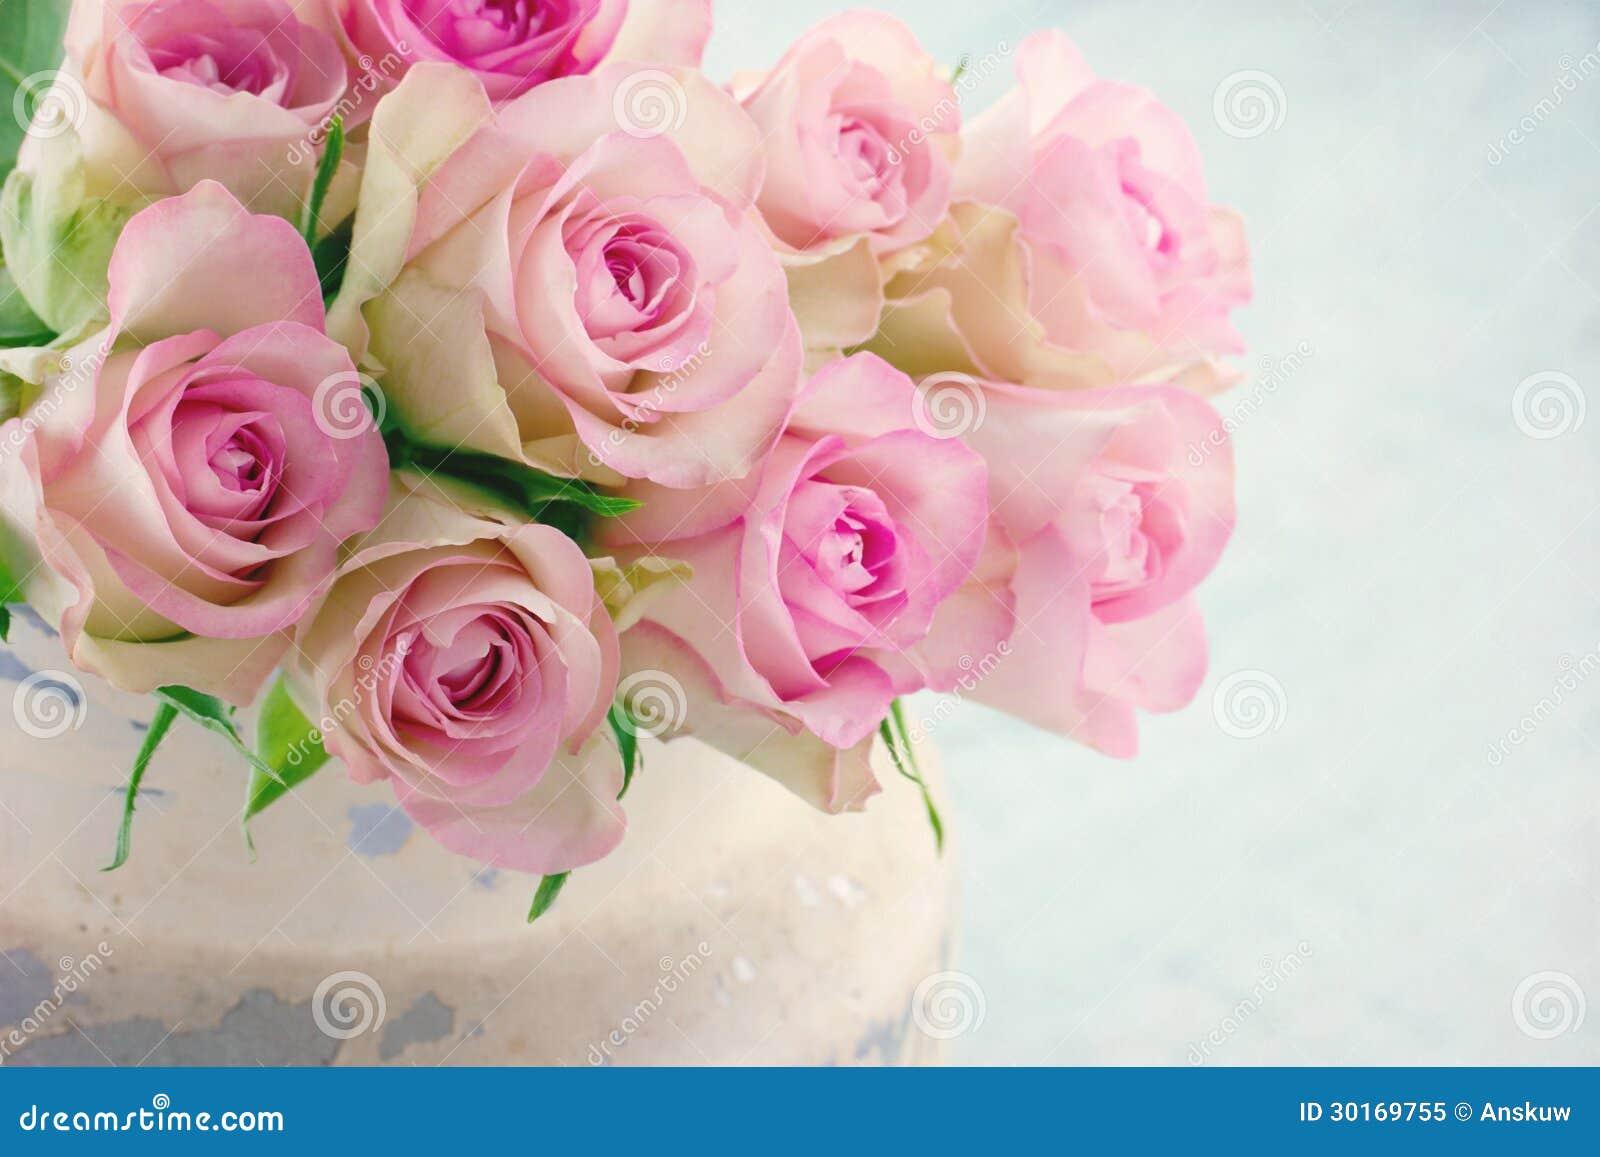 Cake Vase Elegent